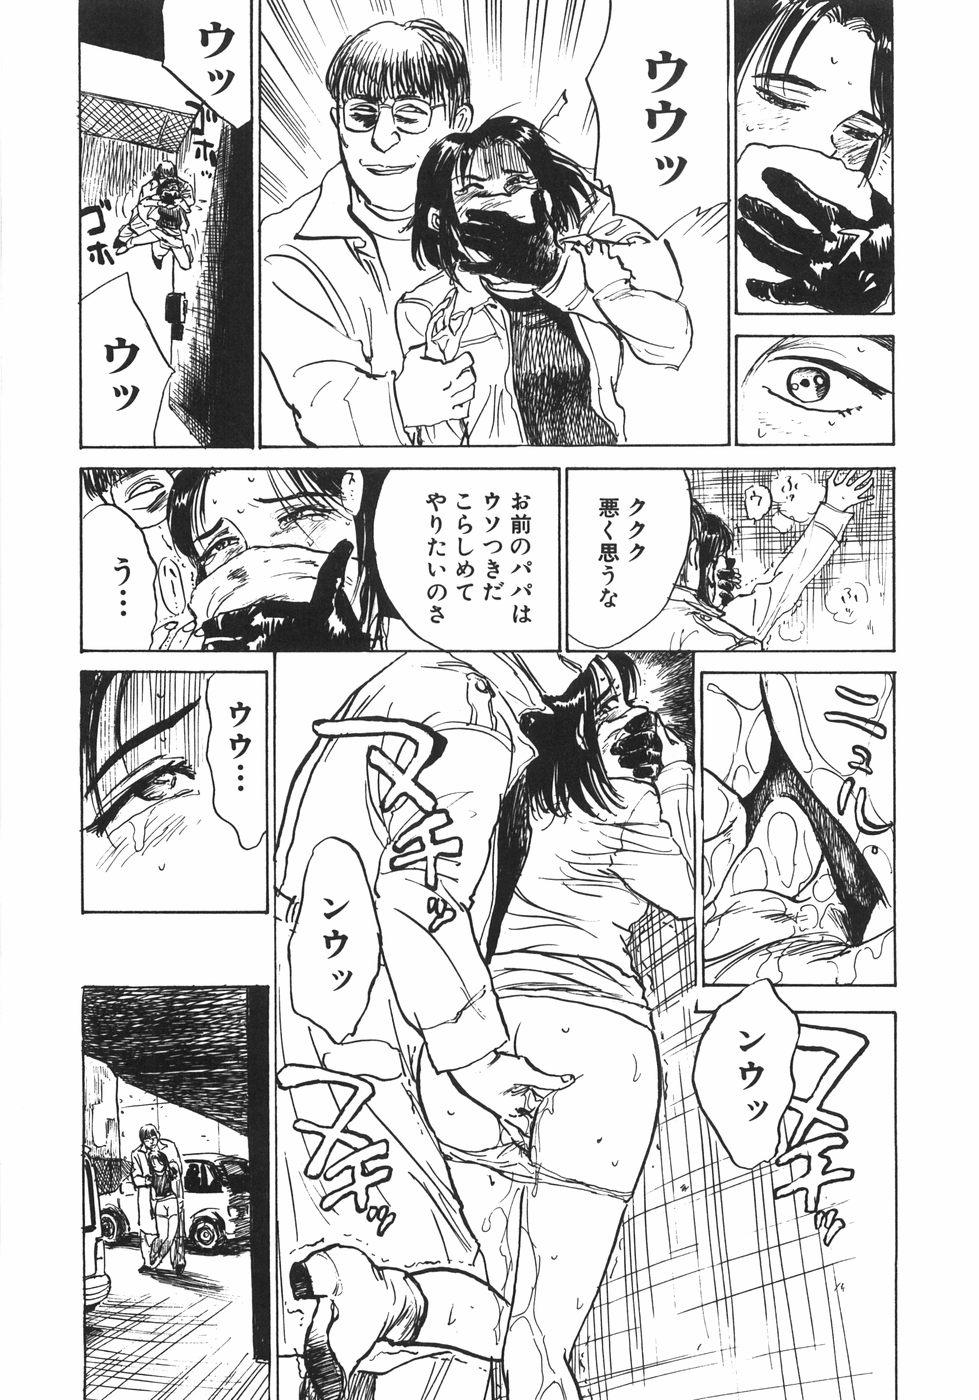 Ningyou no Yakata - The Doll House 77